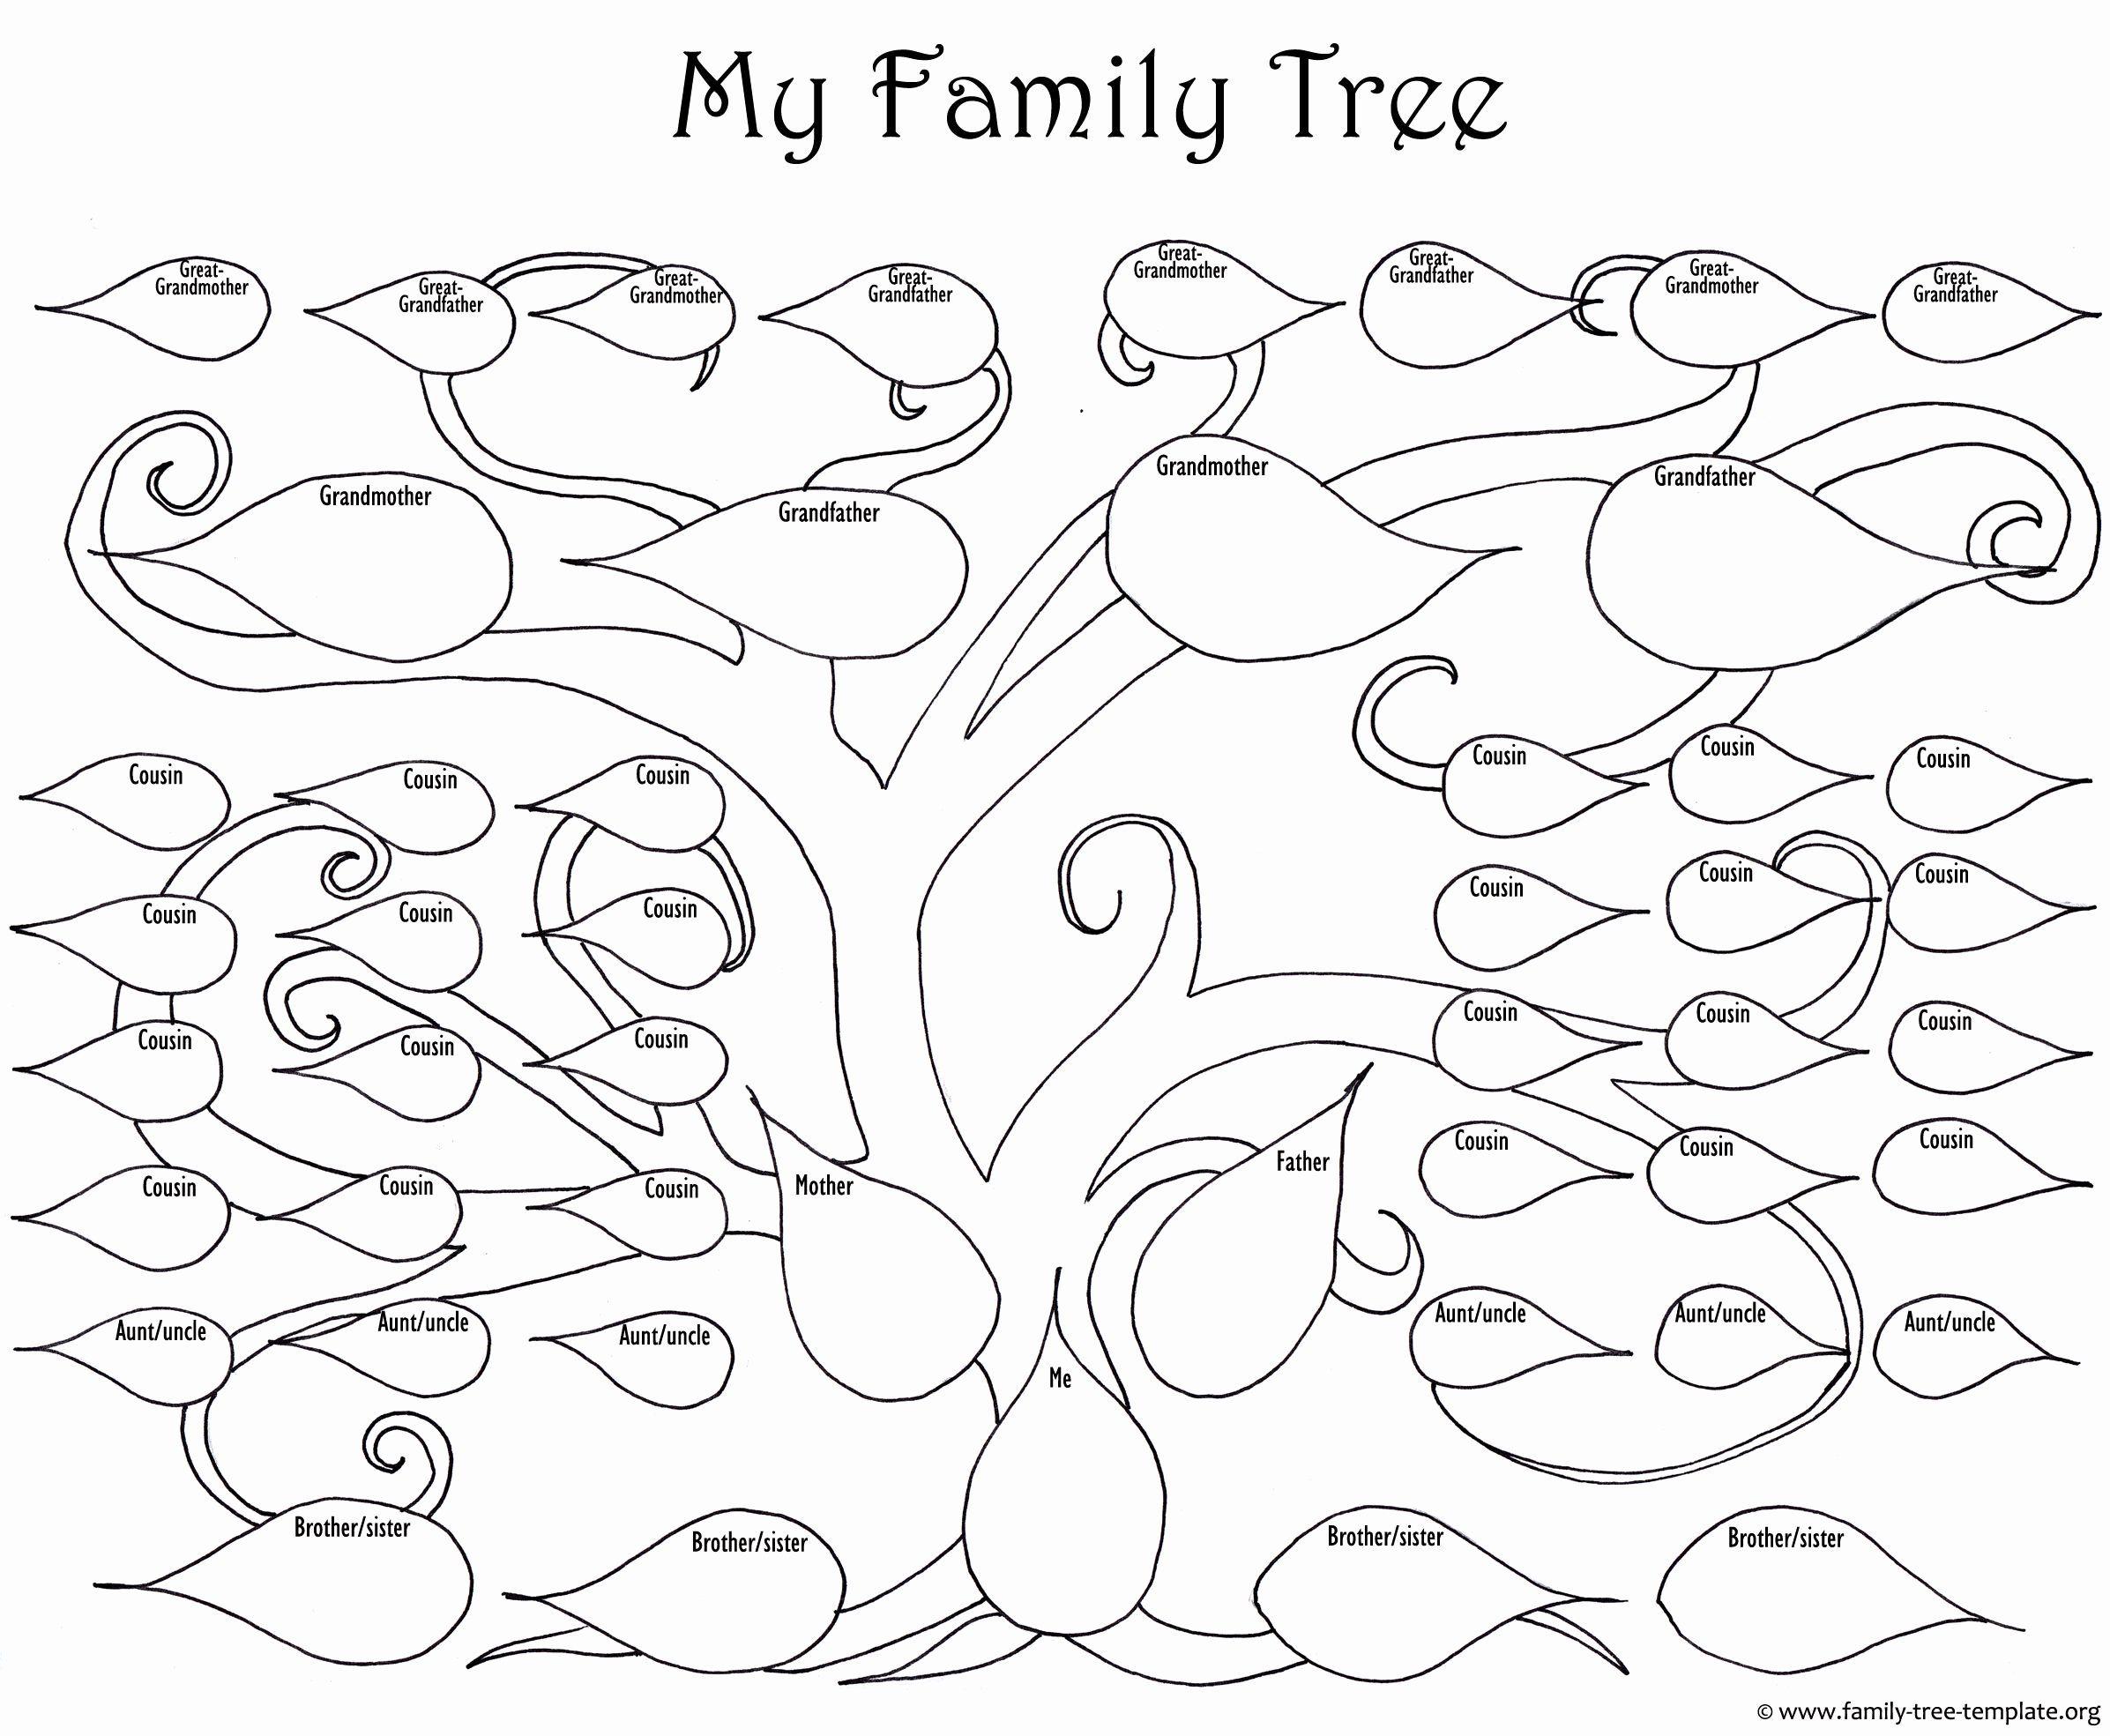 30 Printable Family Tree Charts In 2020 Family Tree Printable